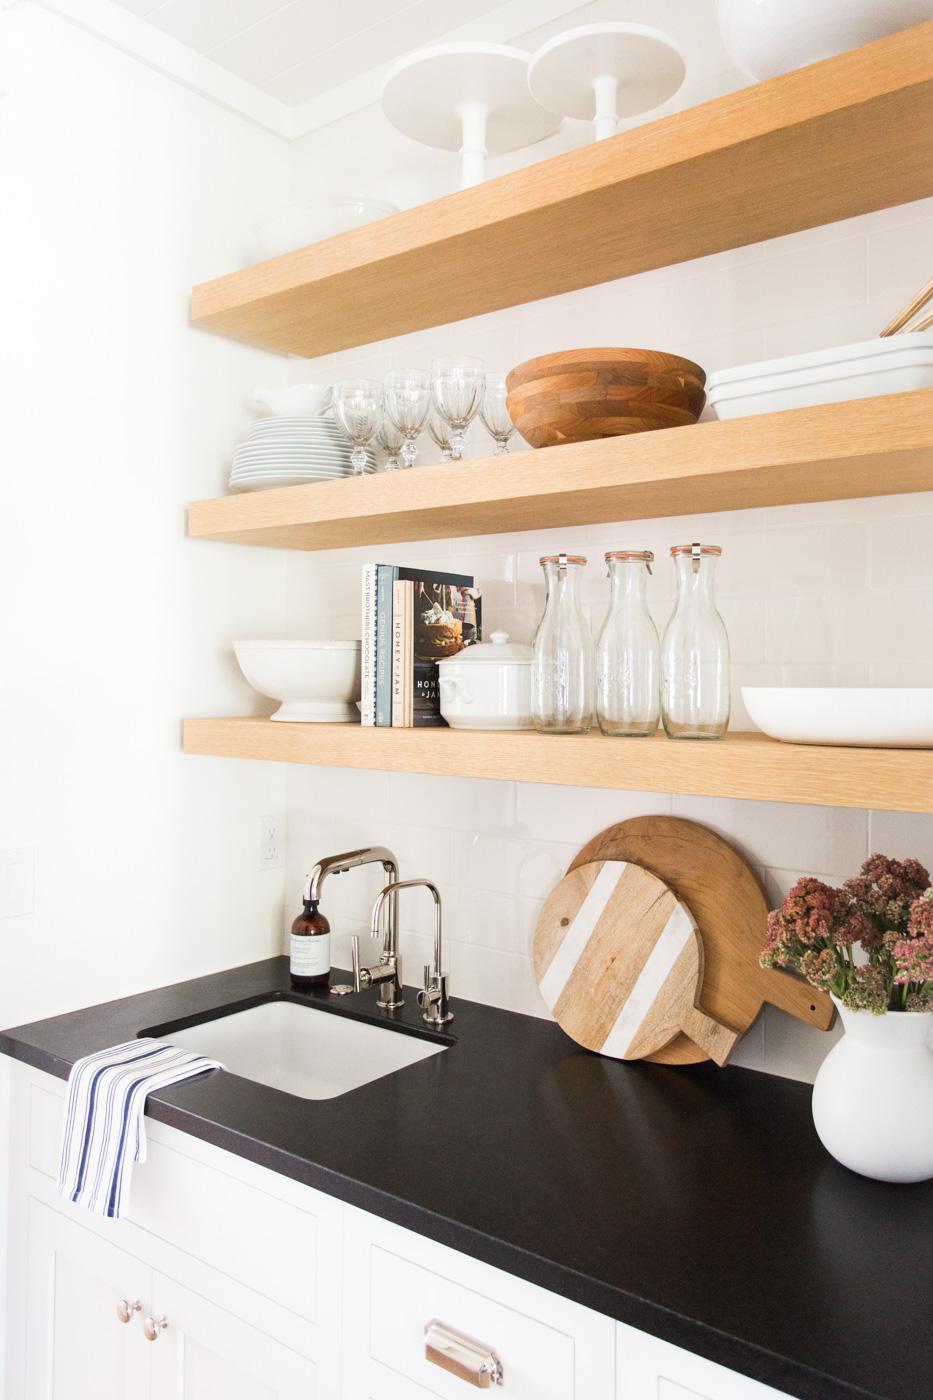 Wooden built in shelves above sink